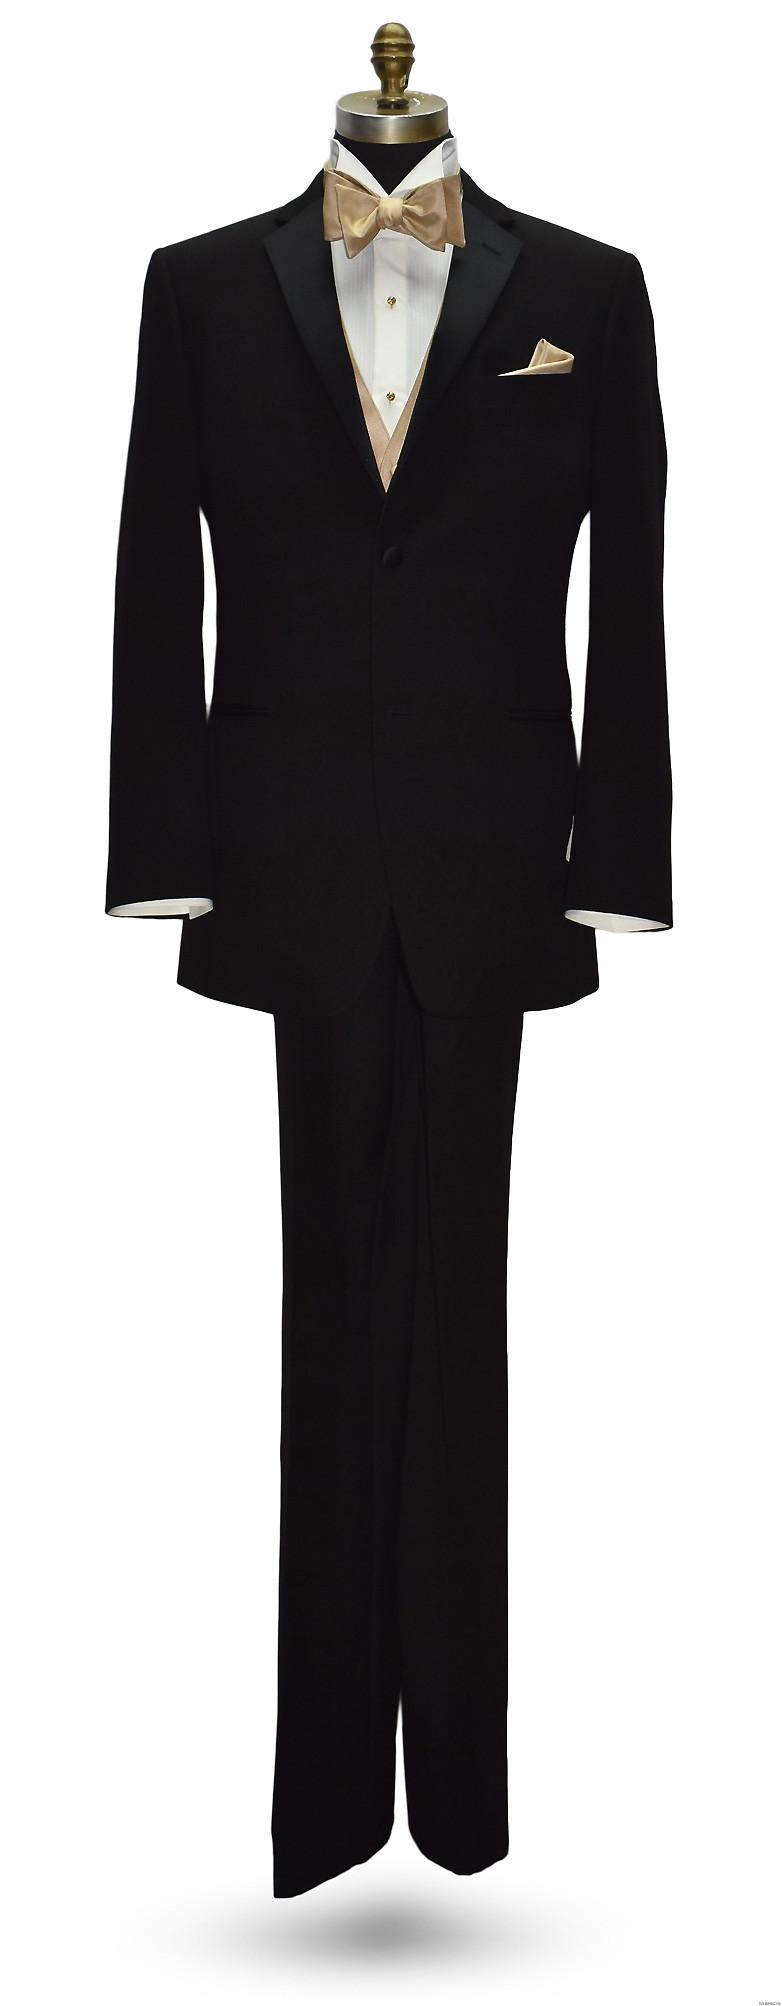 San Miguel black tuxedo with golden vest and bowtie